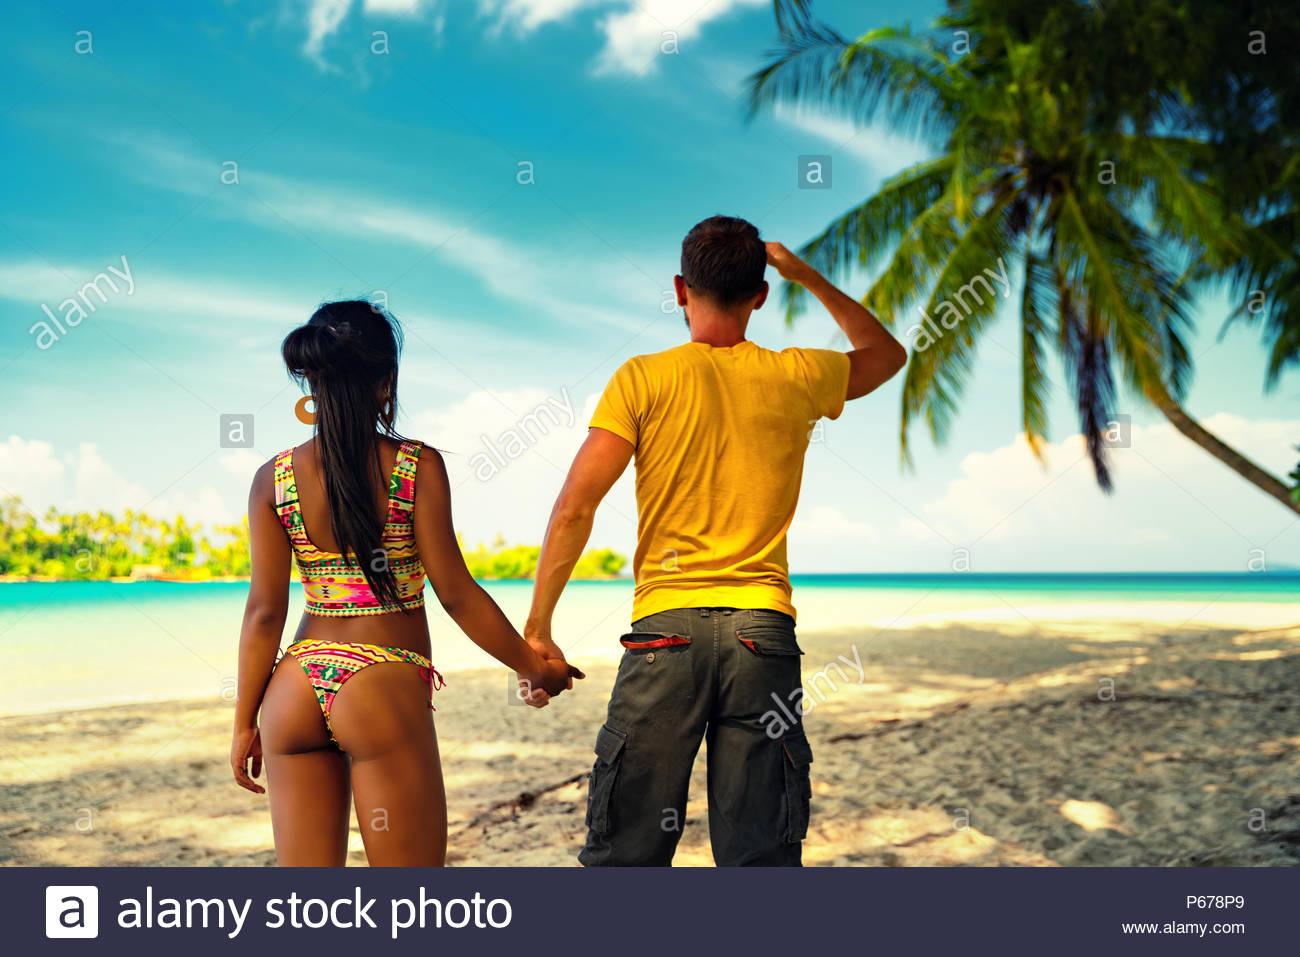 Interracial Loving couple people enjoy honeymoon in tropical 1300x957